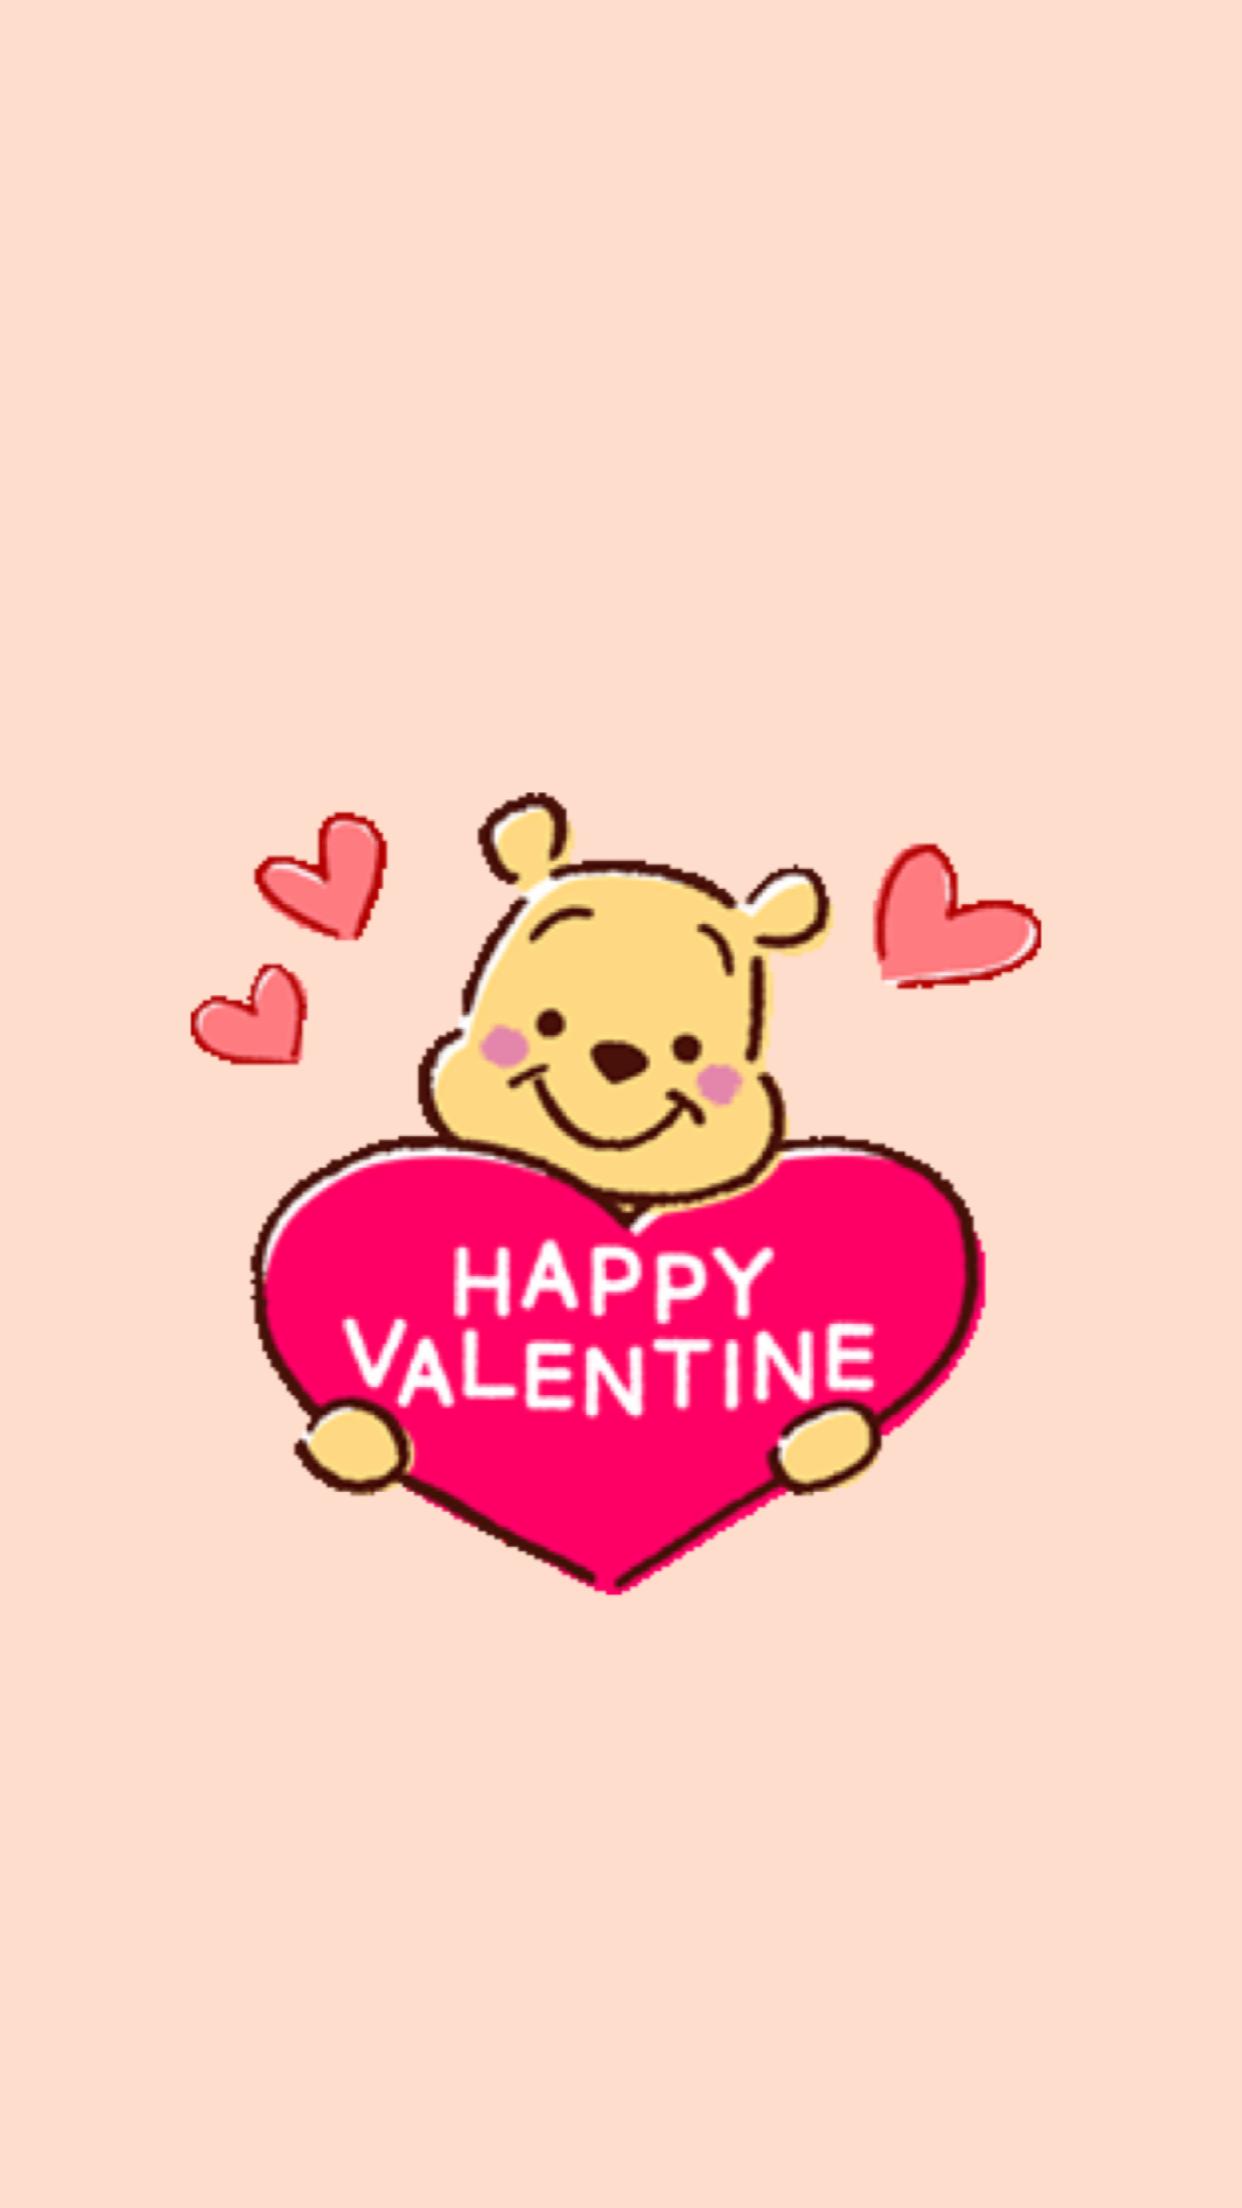 Pin By Wiritsara Chansanat On Wallpapers Valentines Wallpaper Cute Winnie The Pooh Valentine Wallpaper Hd